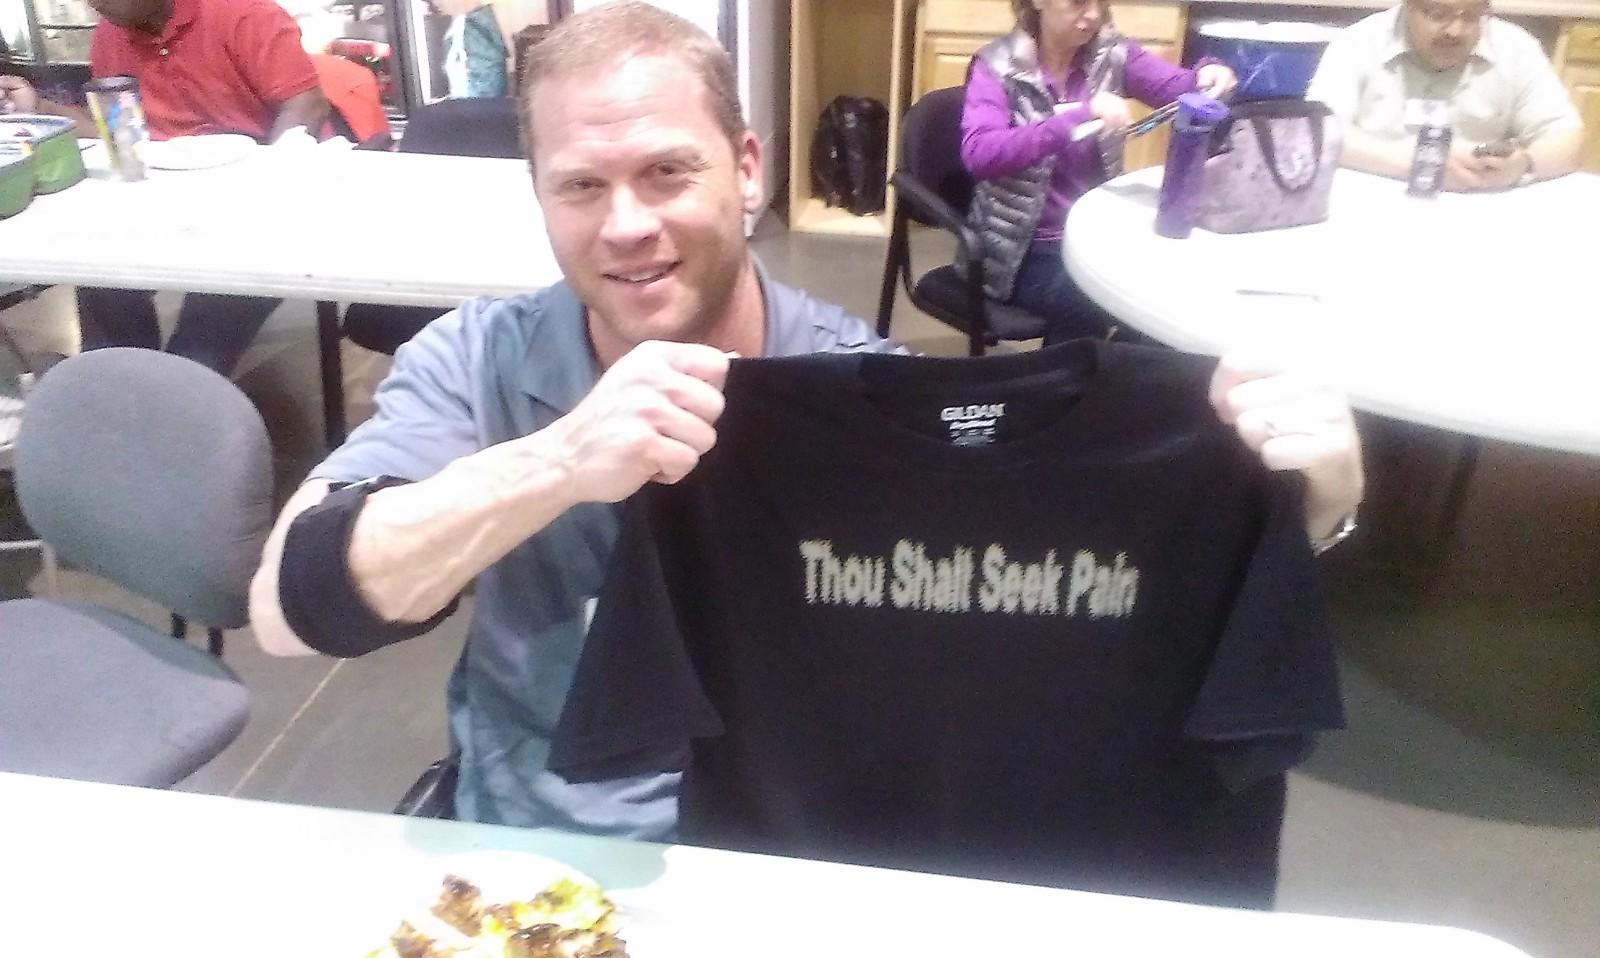 Kevin Sherwin-Thou Shalt Seek Pain